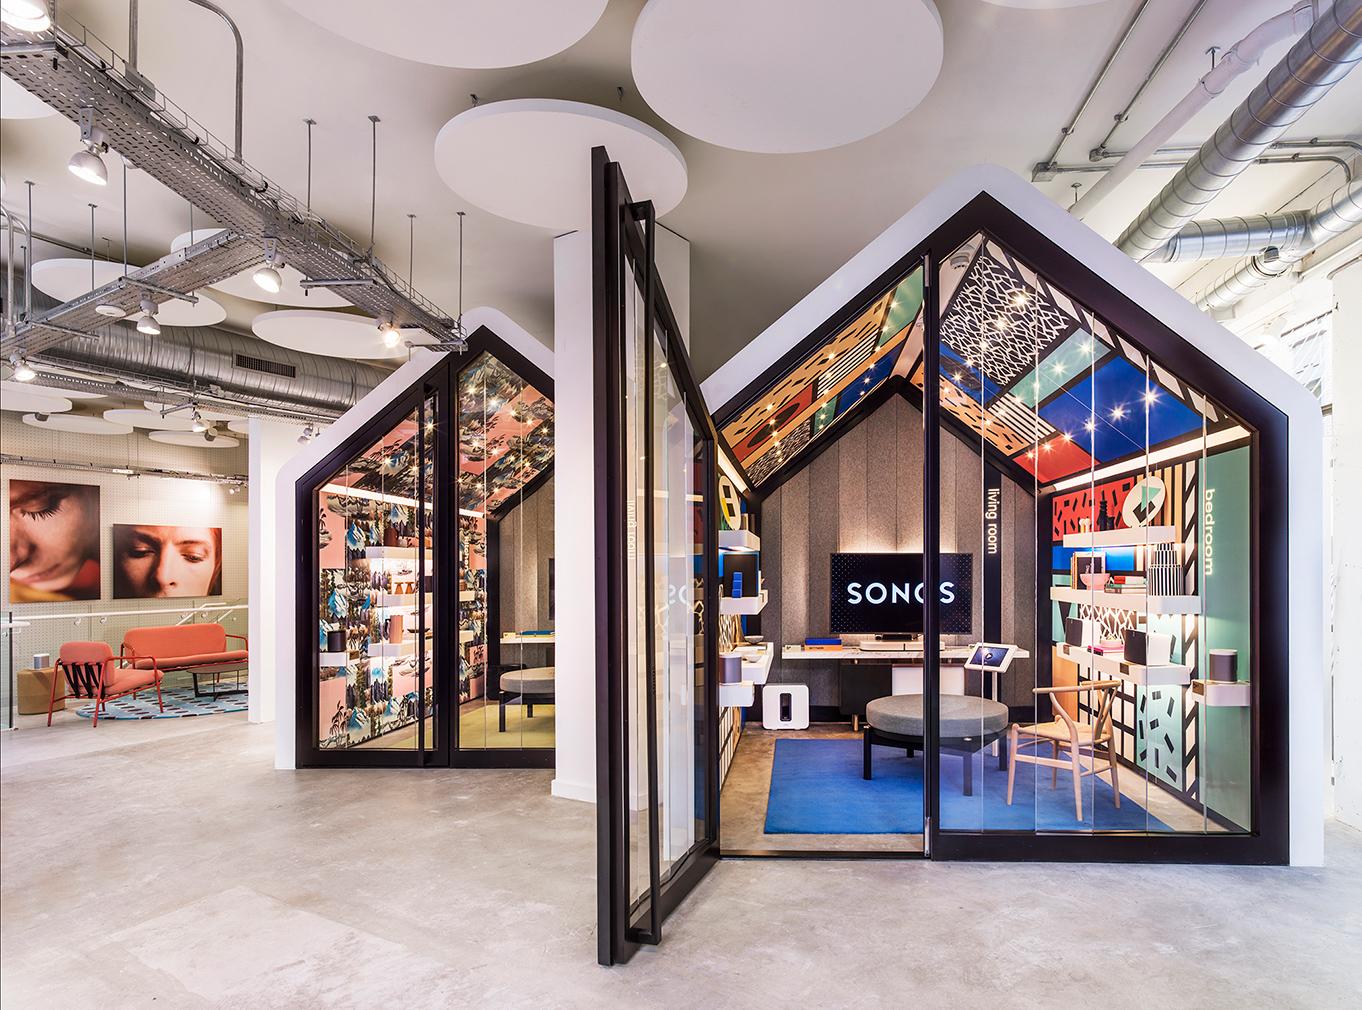 Sonos London Store (Covent Garden)